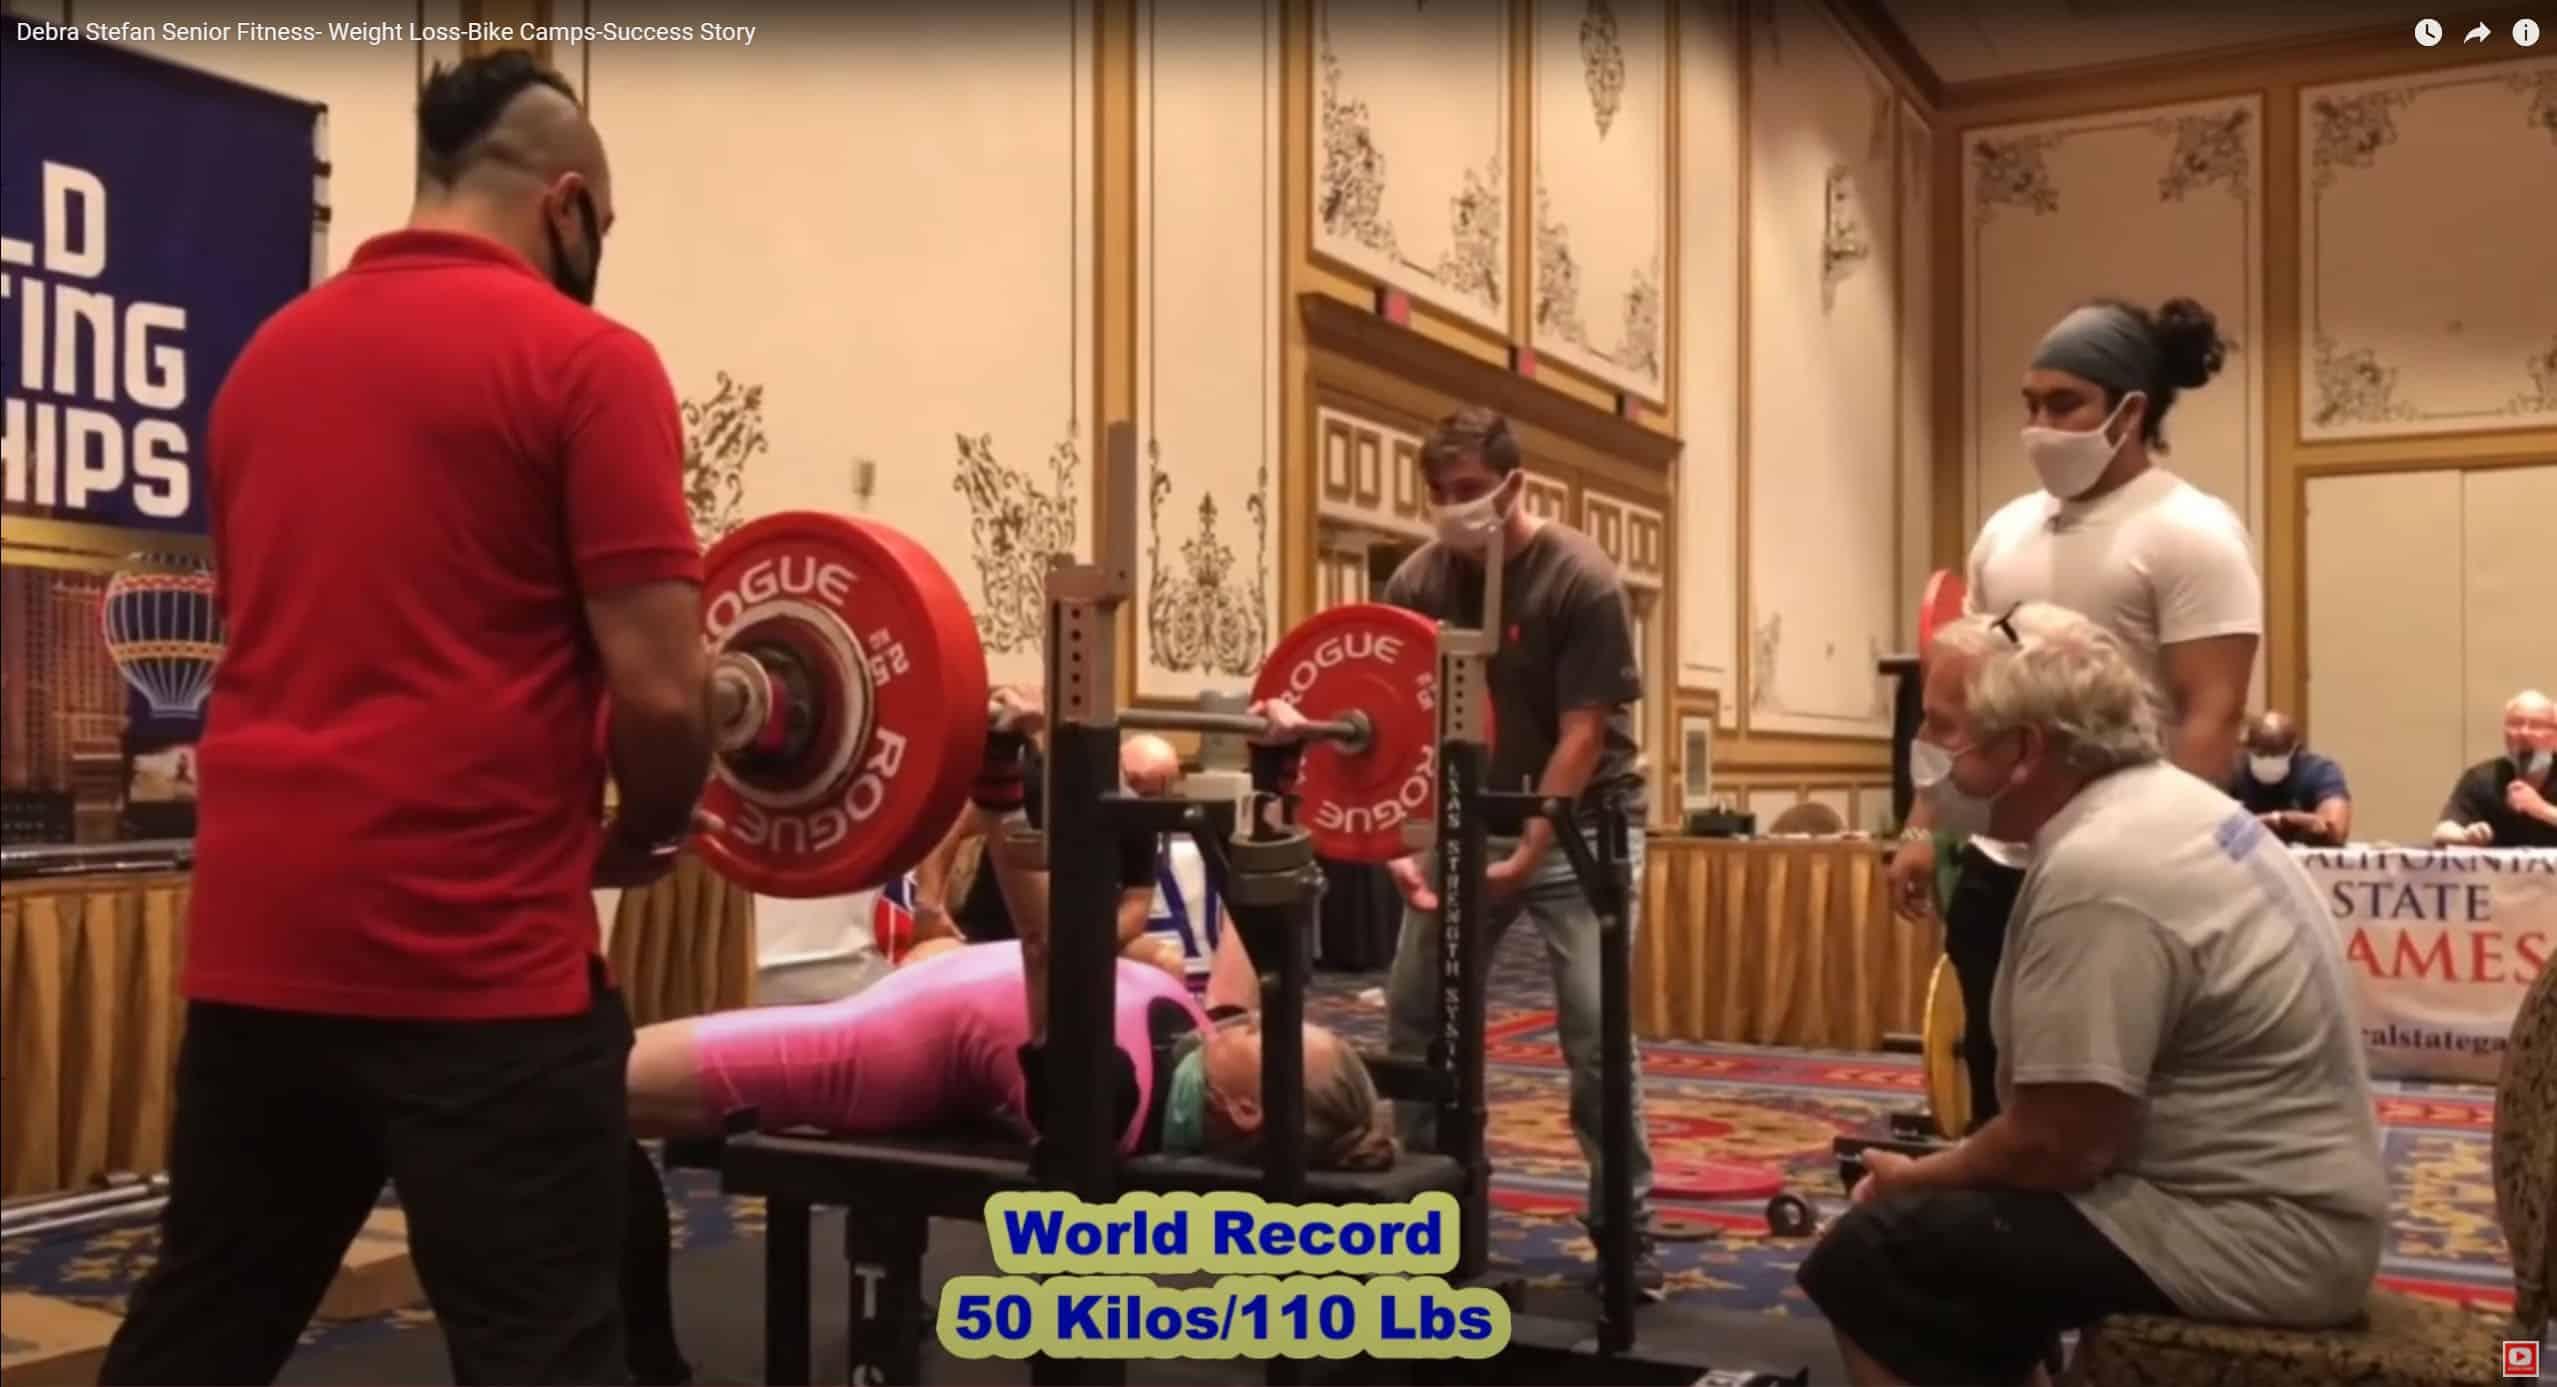 Debra Stefan Fitness Records